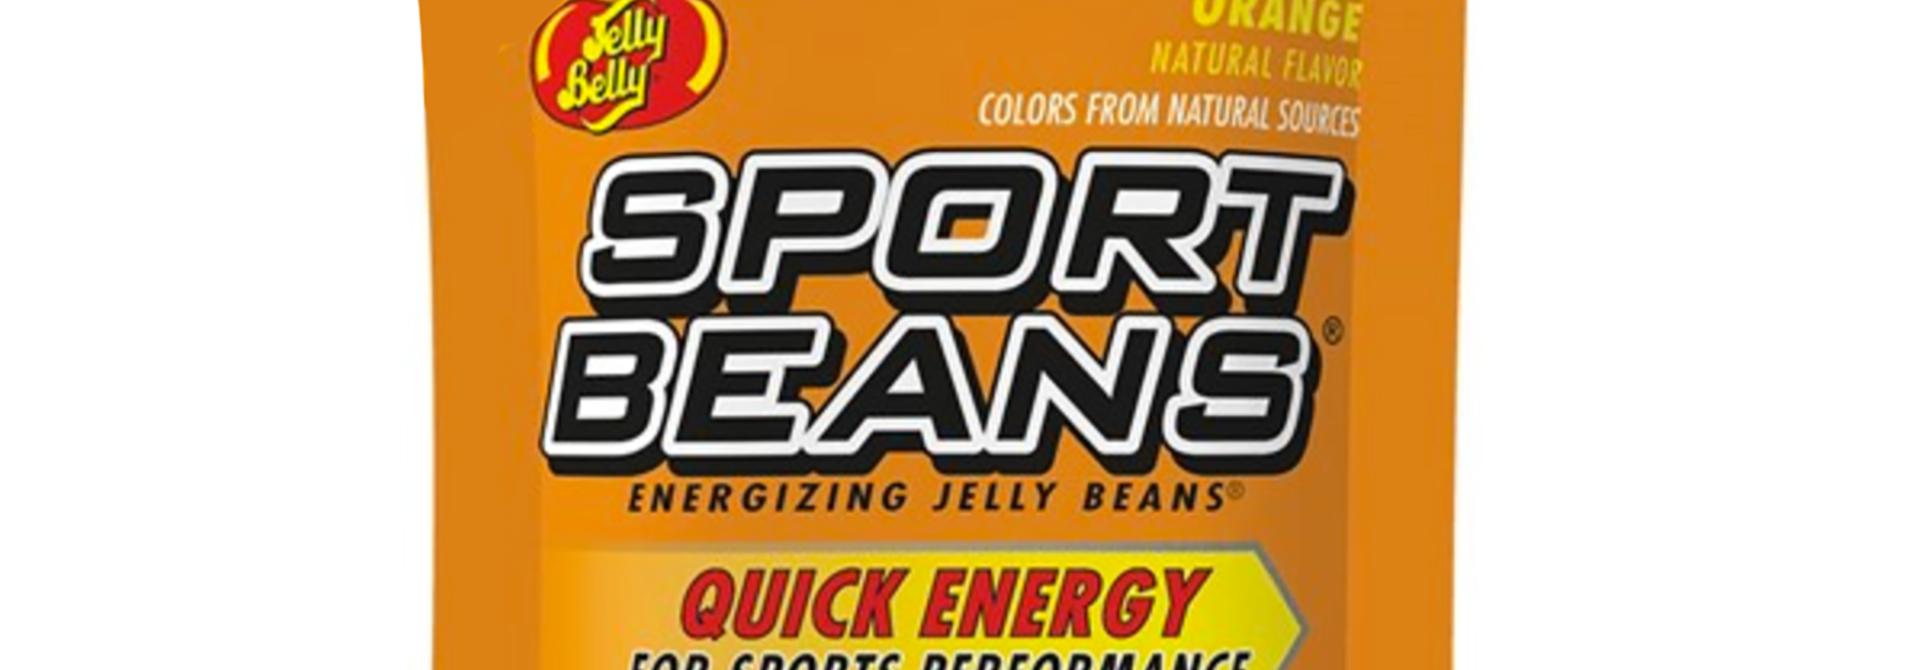 Sport Beans - Orange 1 oz